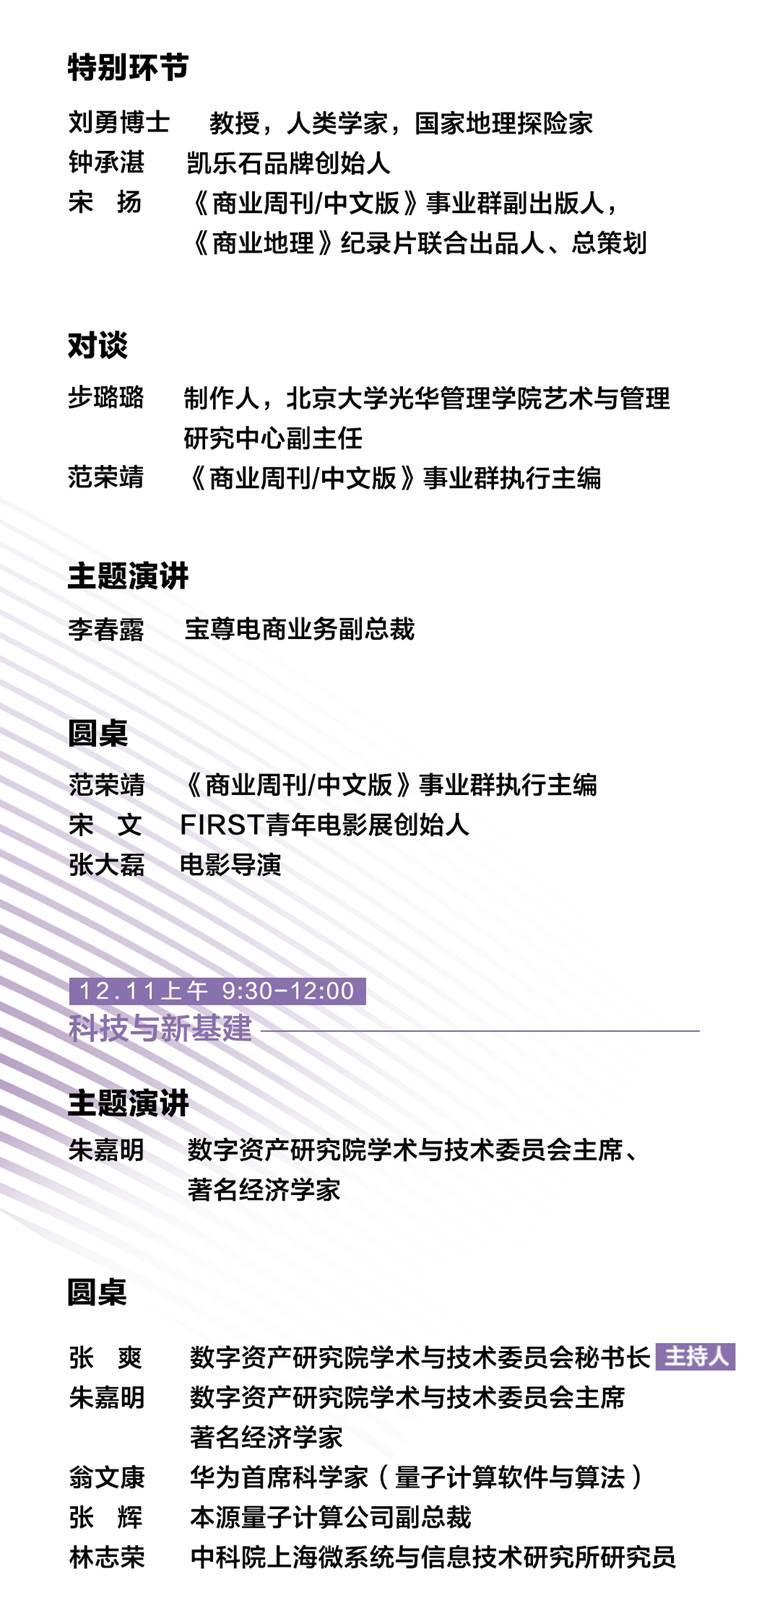 2021TYA议程第10版_03.jpg